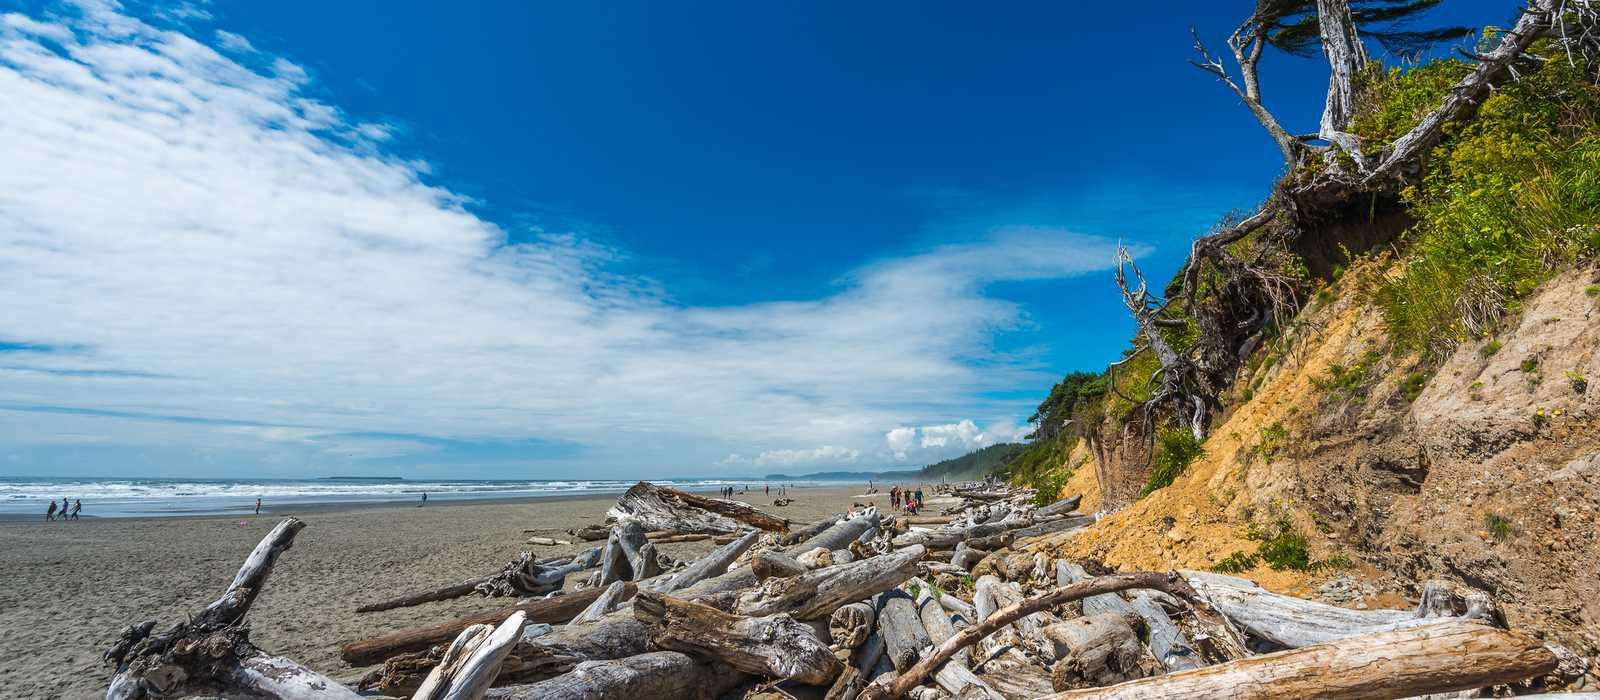 Blick auf den Kalaloch Beach im Olympic National Park in Washington